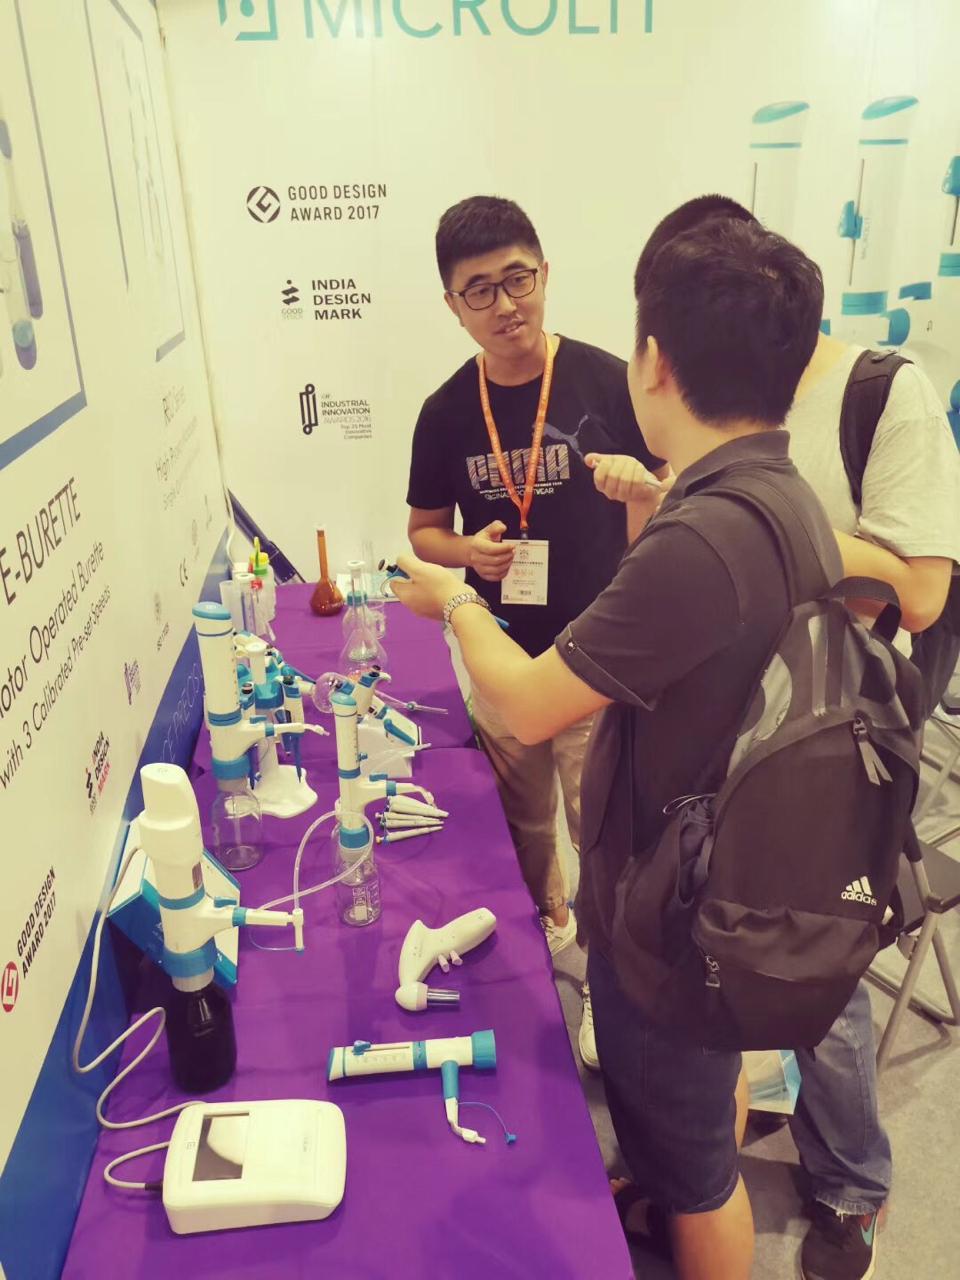 Guangzhou International Bio-Technology Expo 2019 - 4